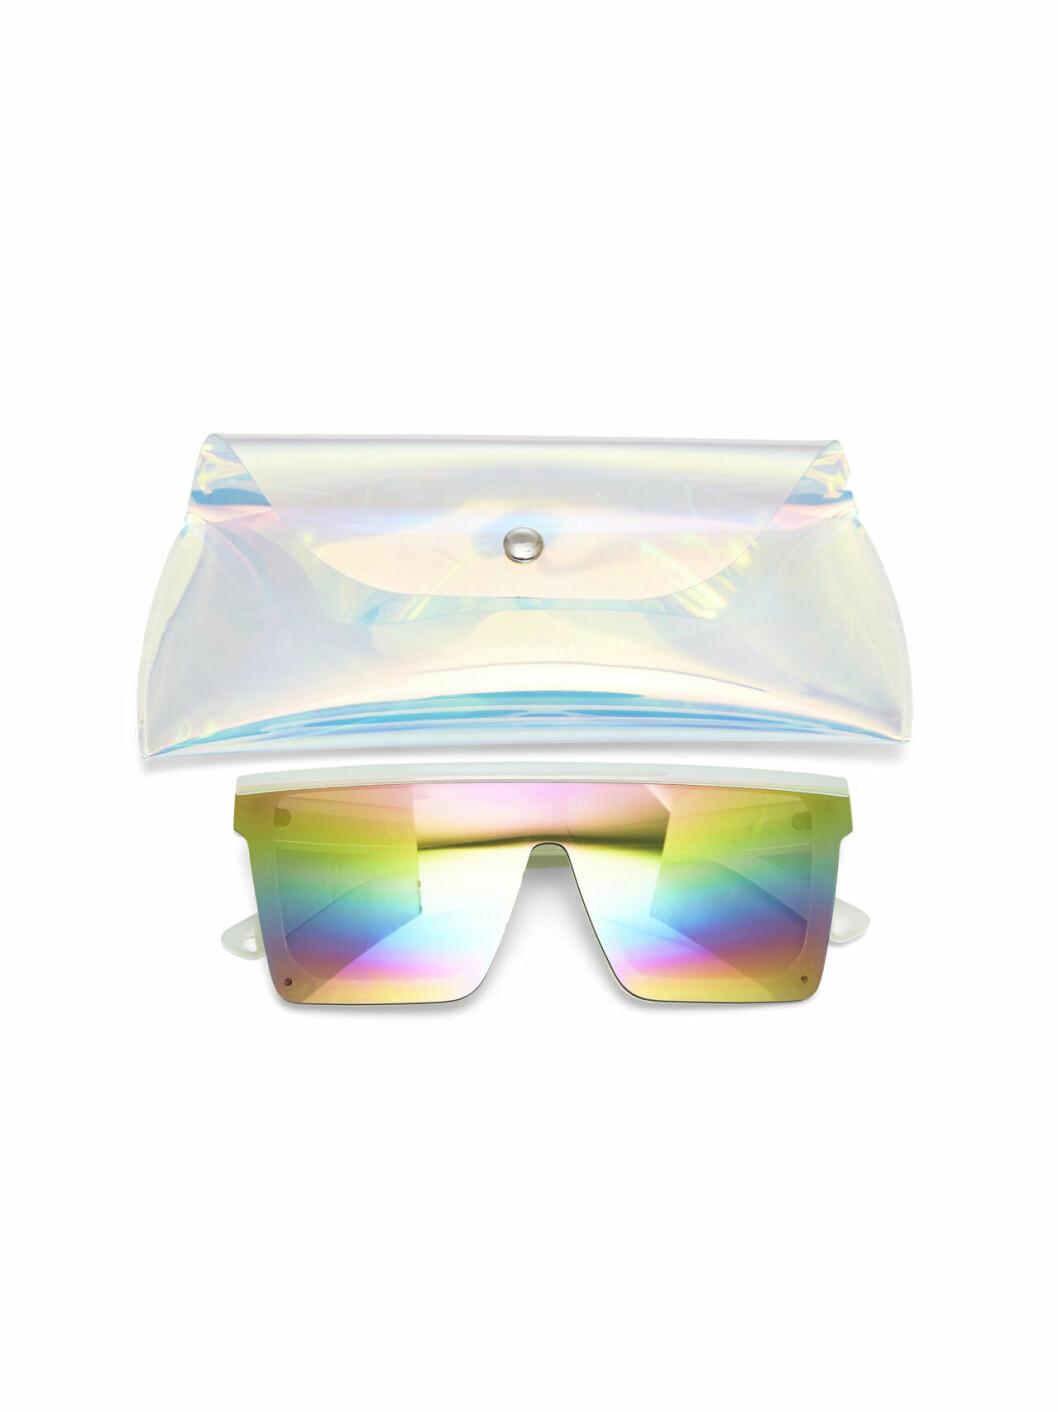 Skidglasögon i färg från BIK bOK